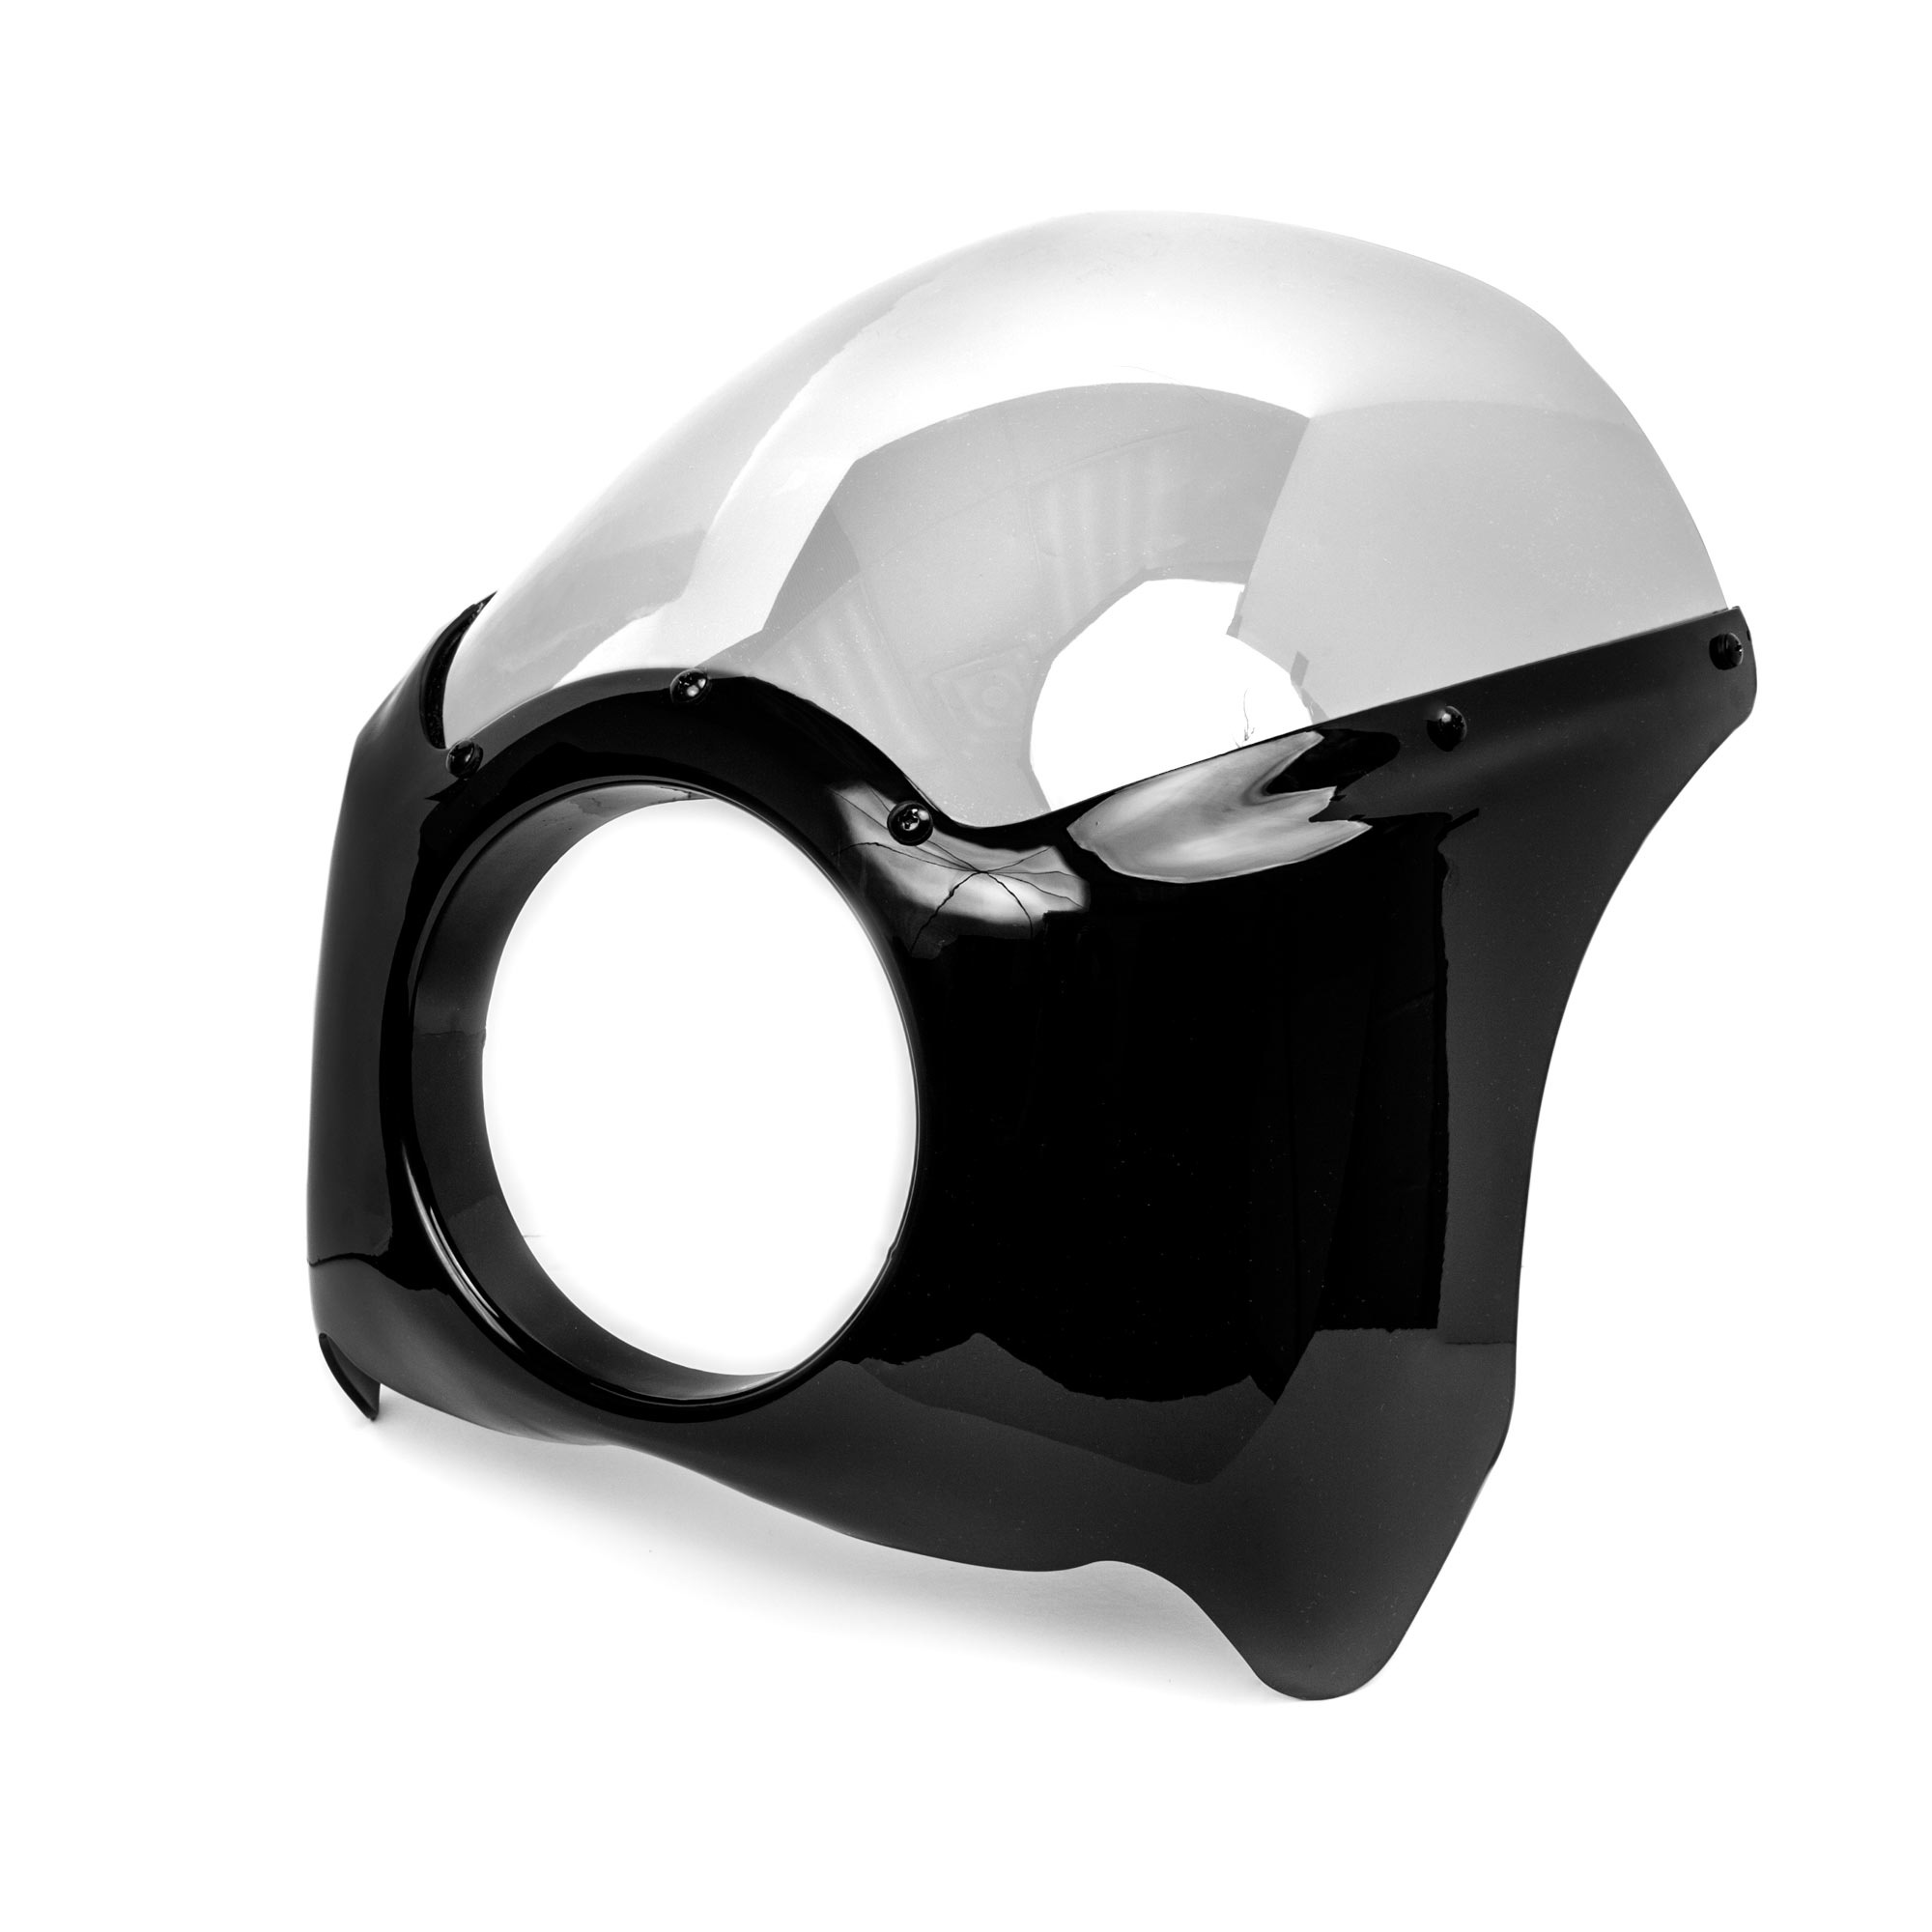 Krator Black & Clear Headlight Fairing Windshield Kit for Kawasaki ZR Zephyr 550 750 - image 5 of 6